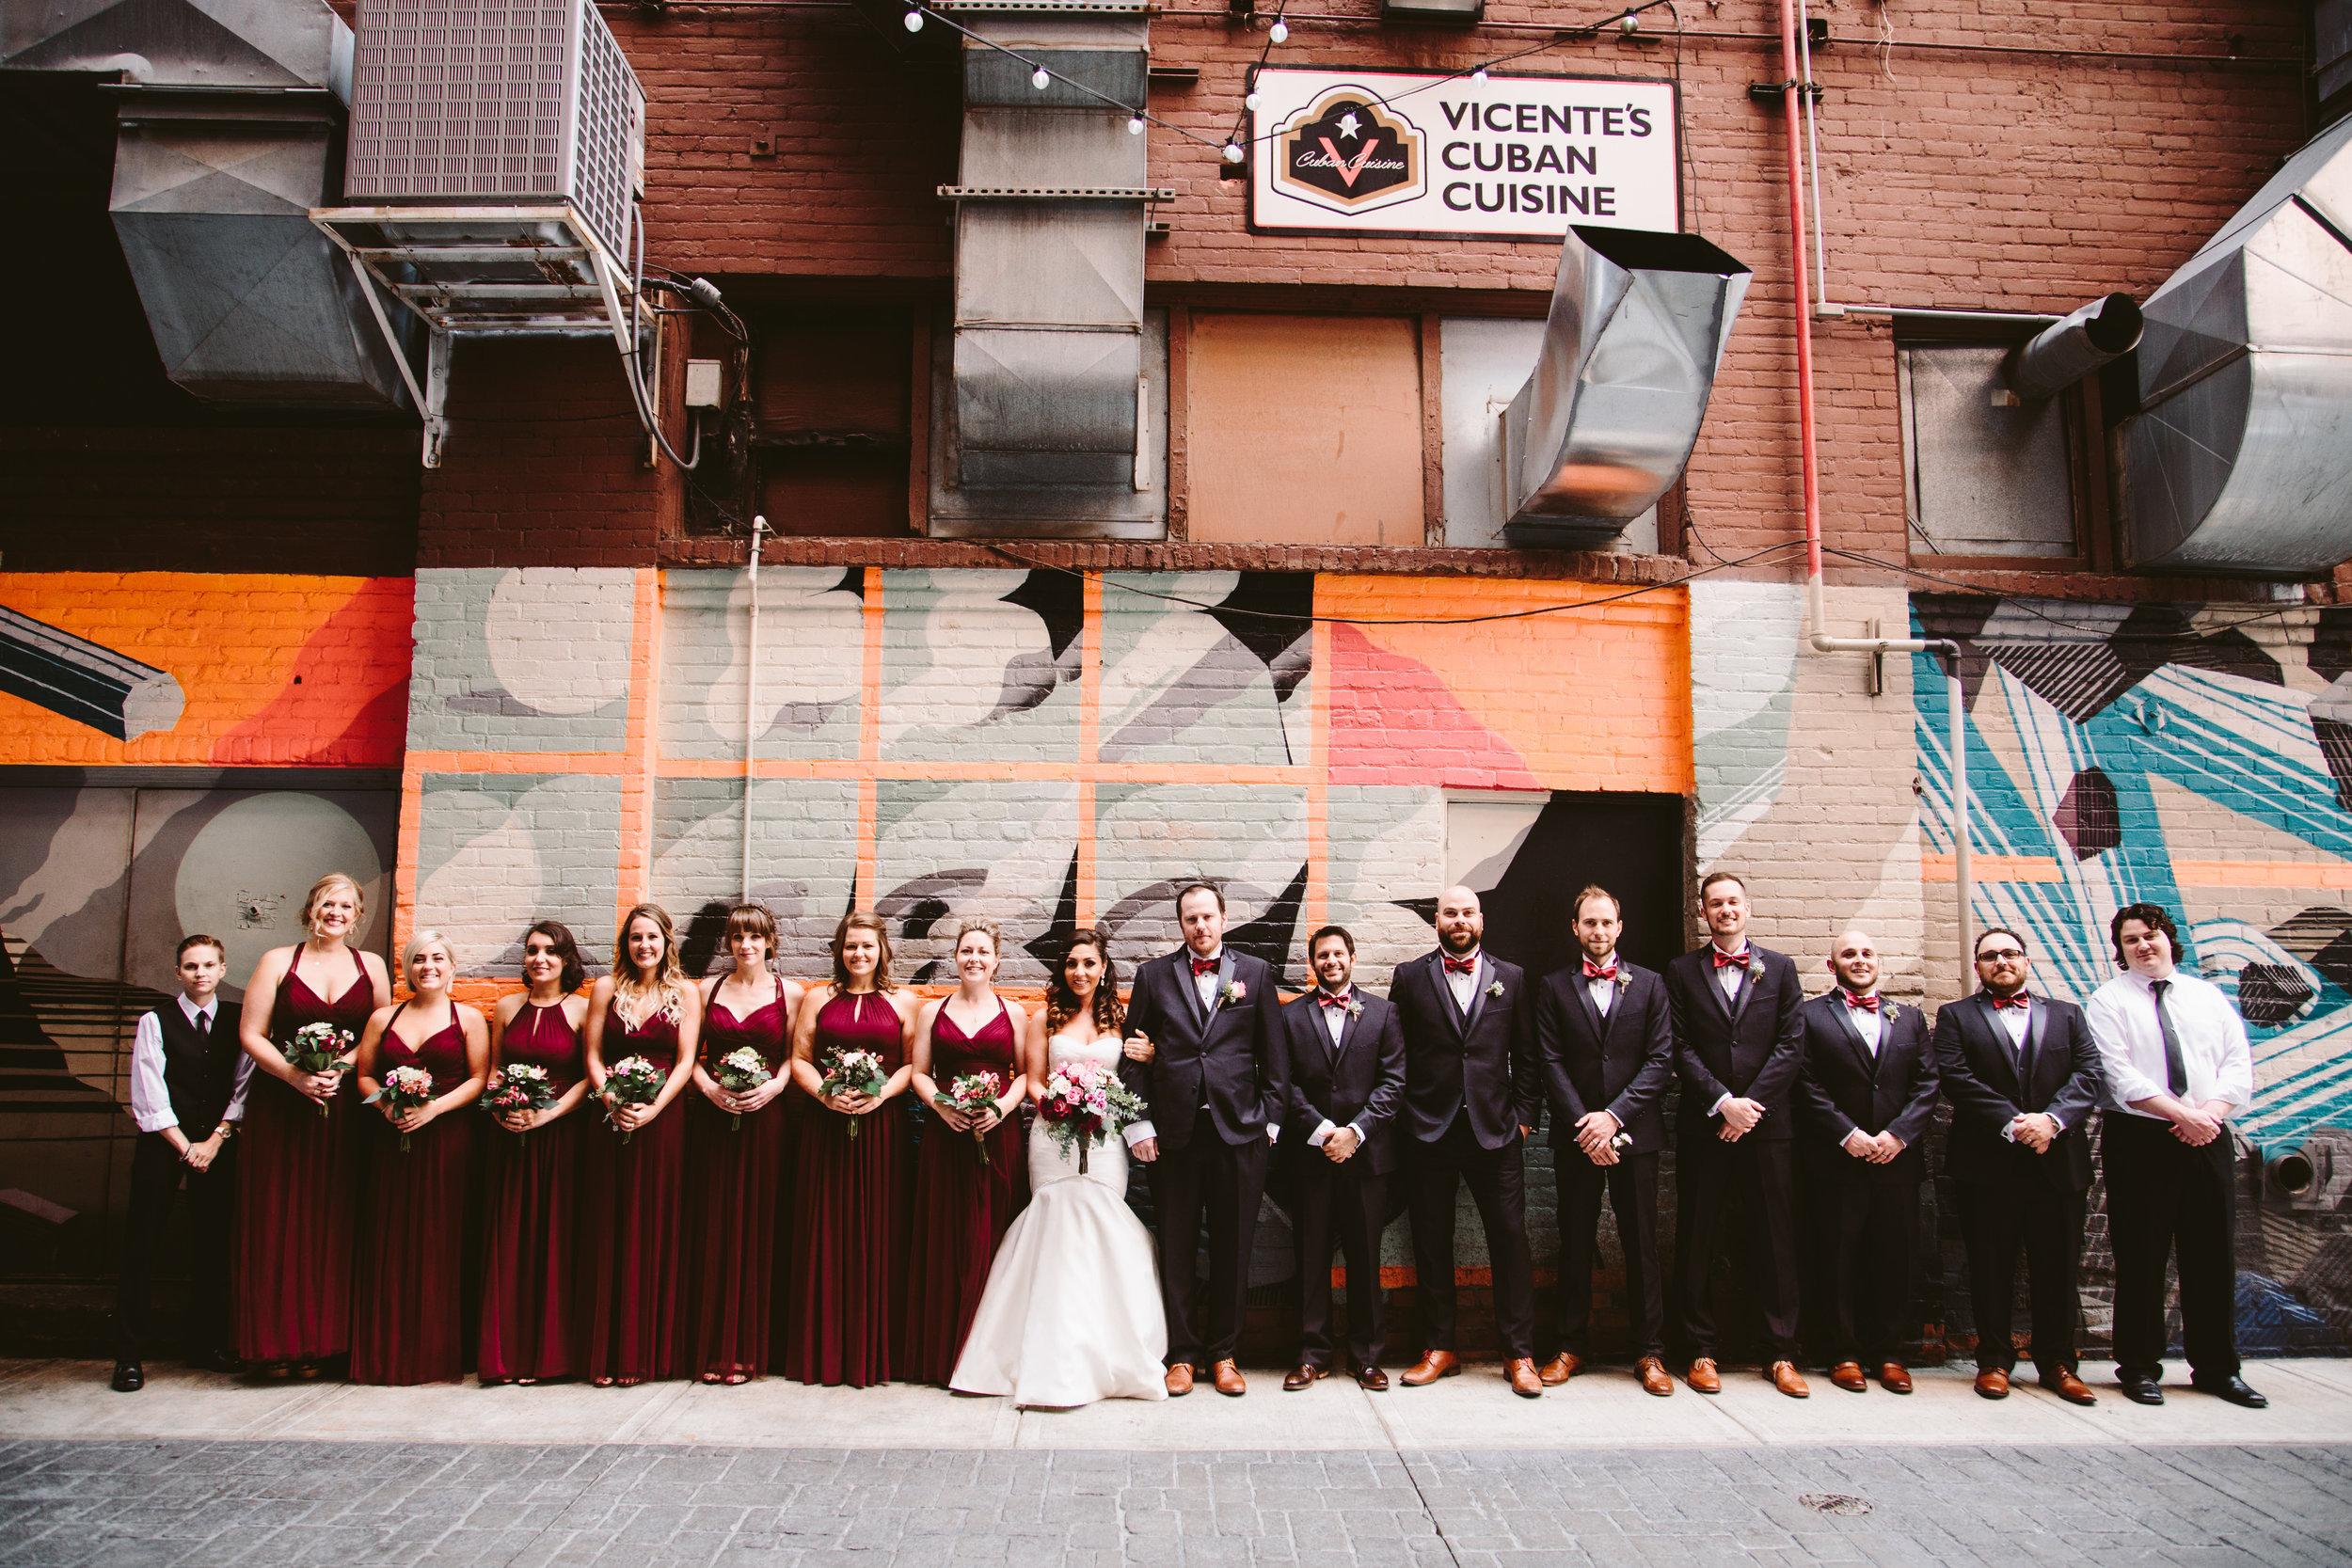 detroit eastern market bridal party